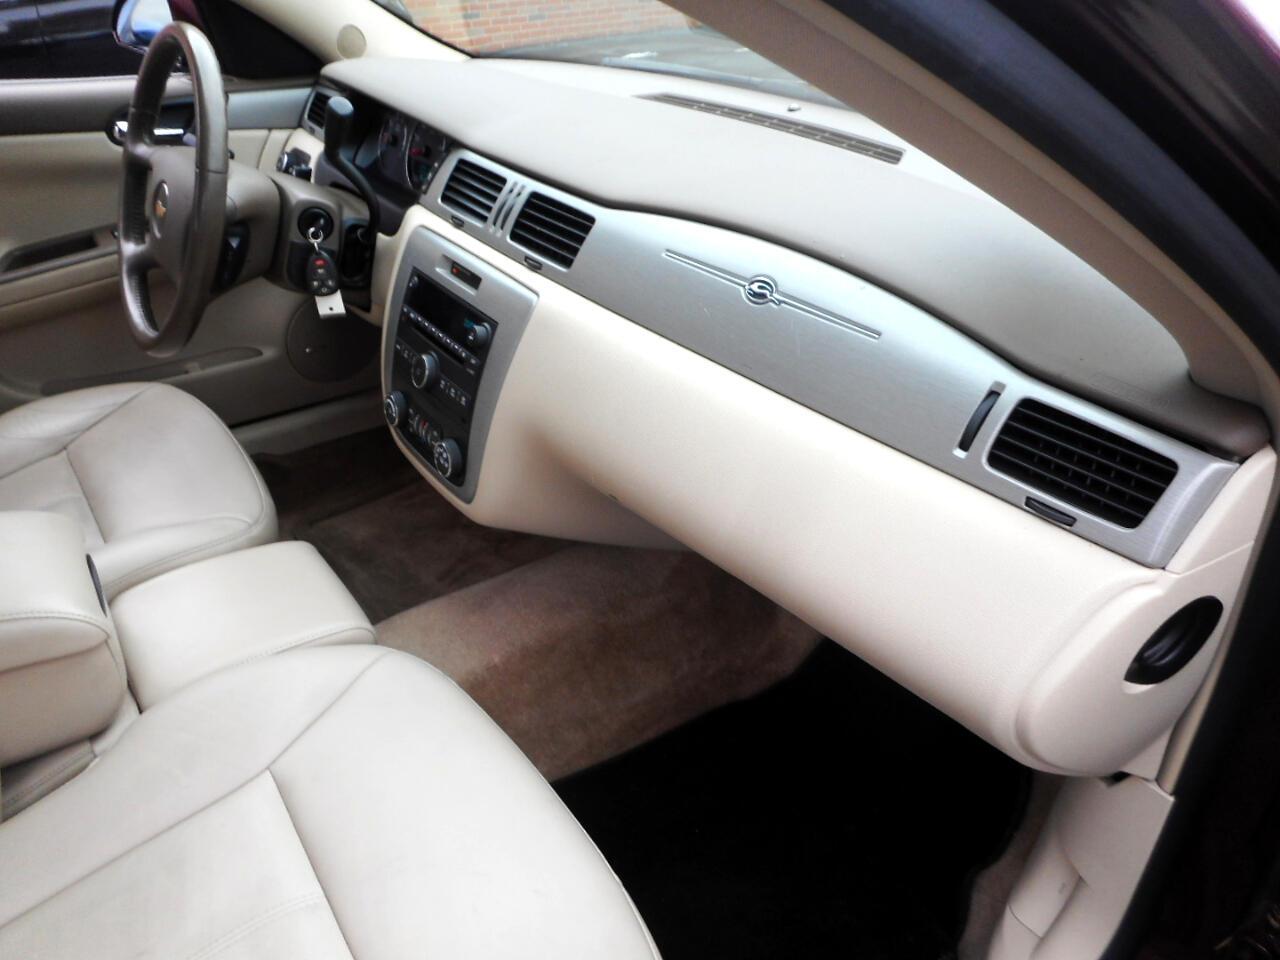 2007 Chevrolet Impala LT3 3.9L